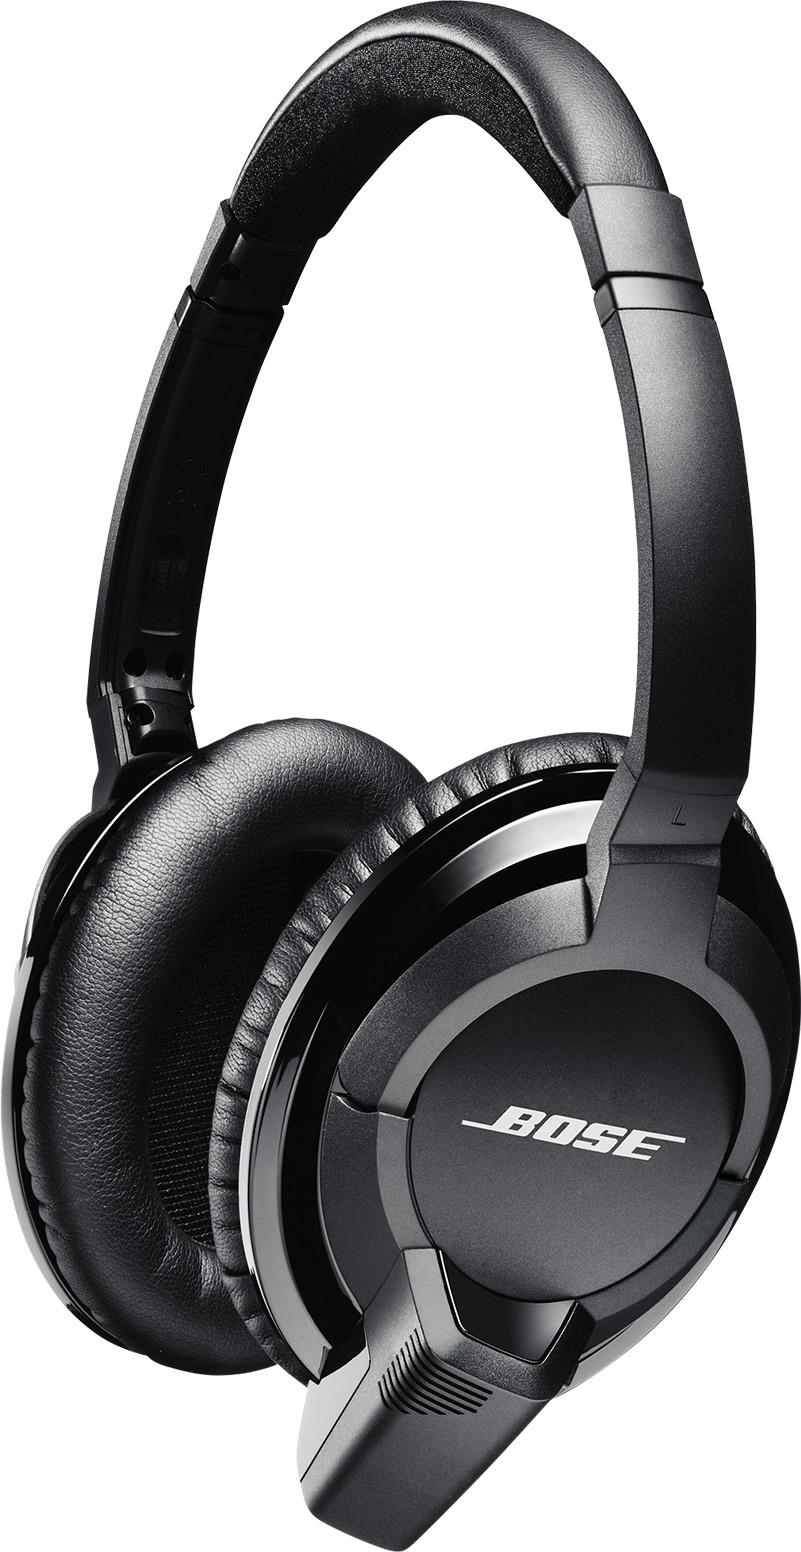 Bose SoundLink Around-EarBluetooth Headphones